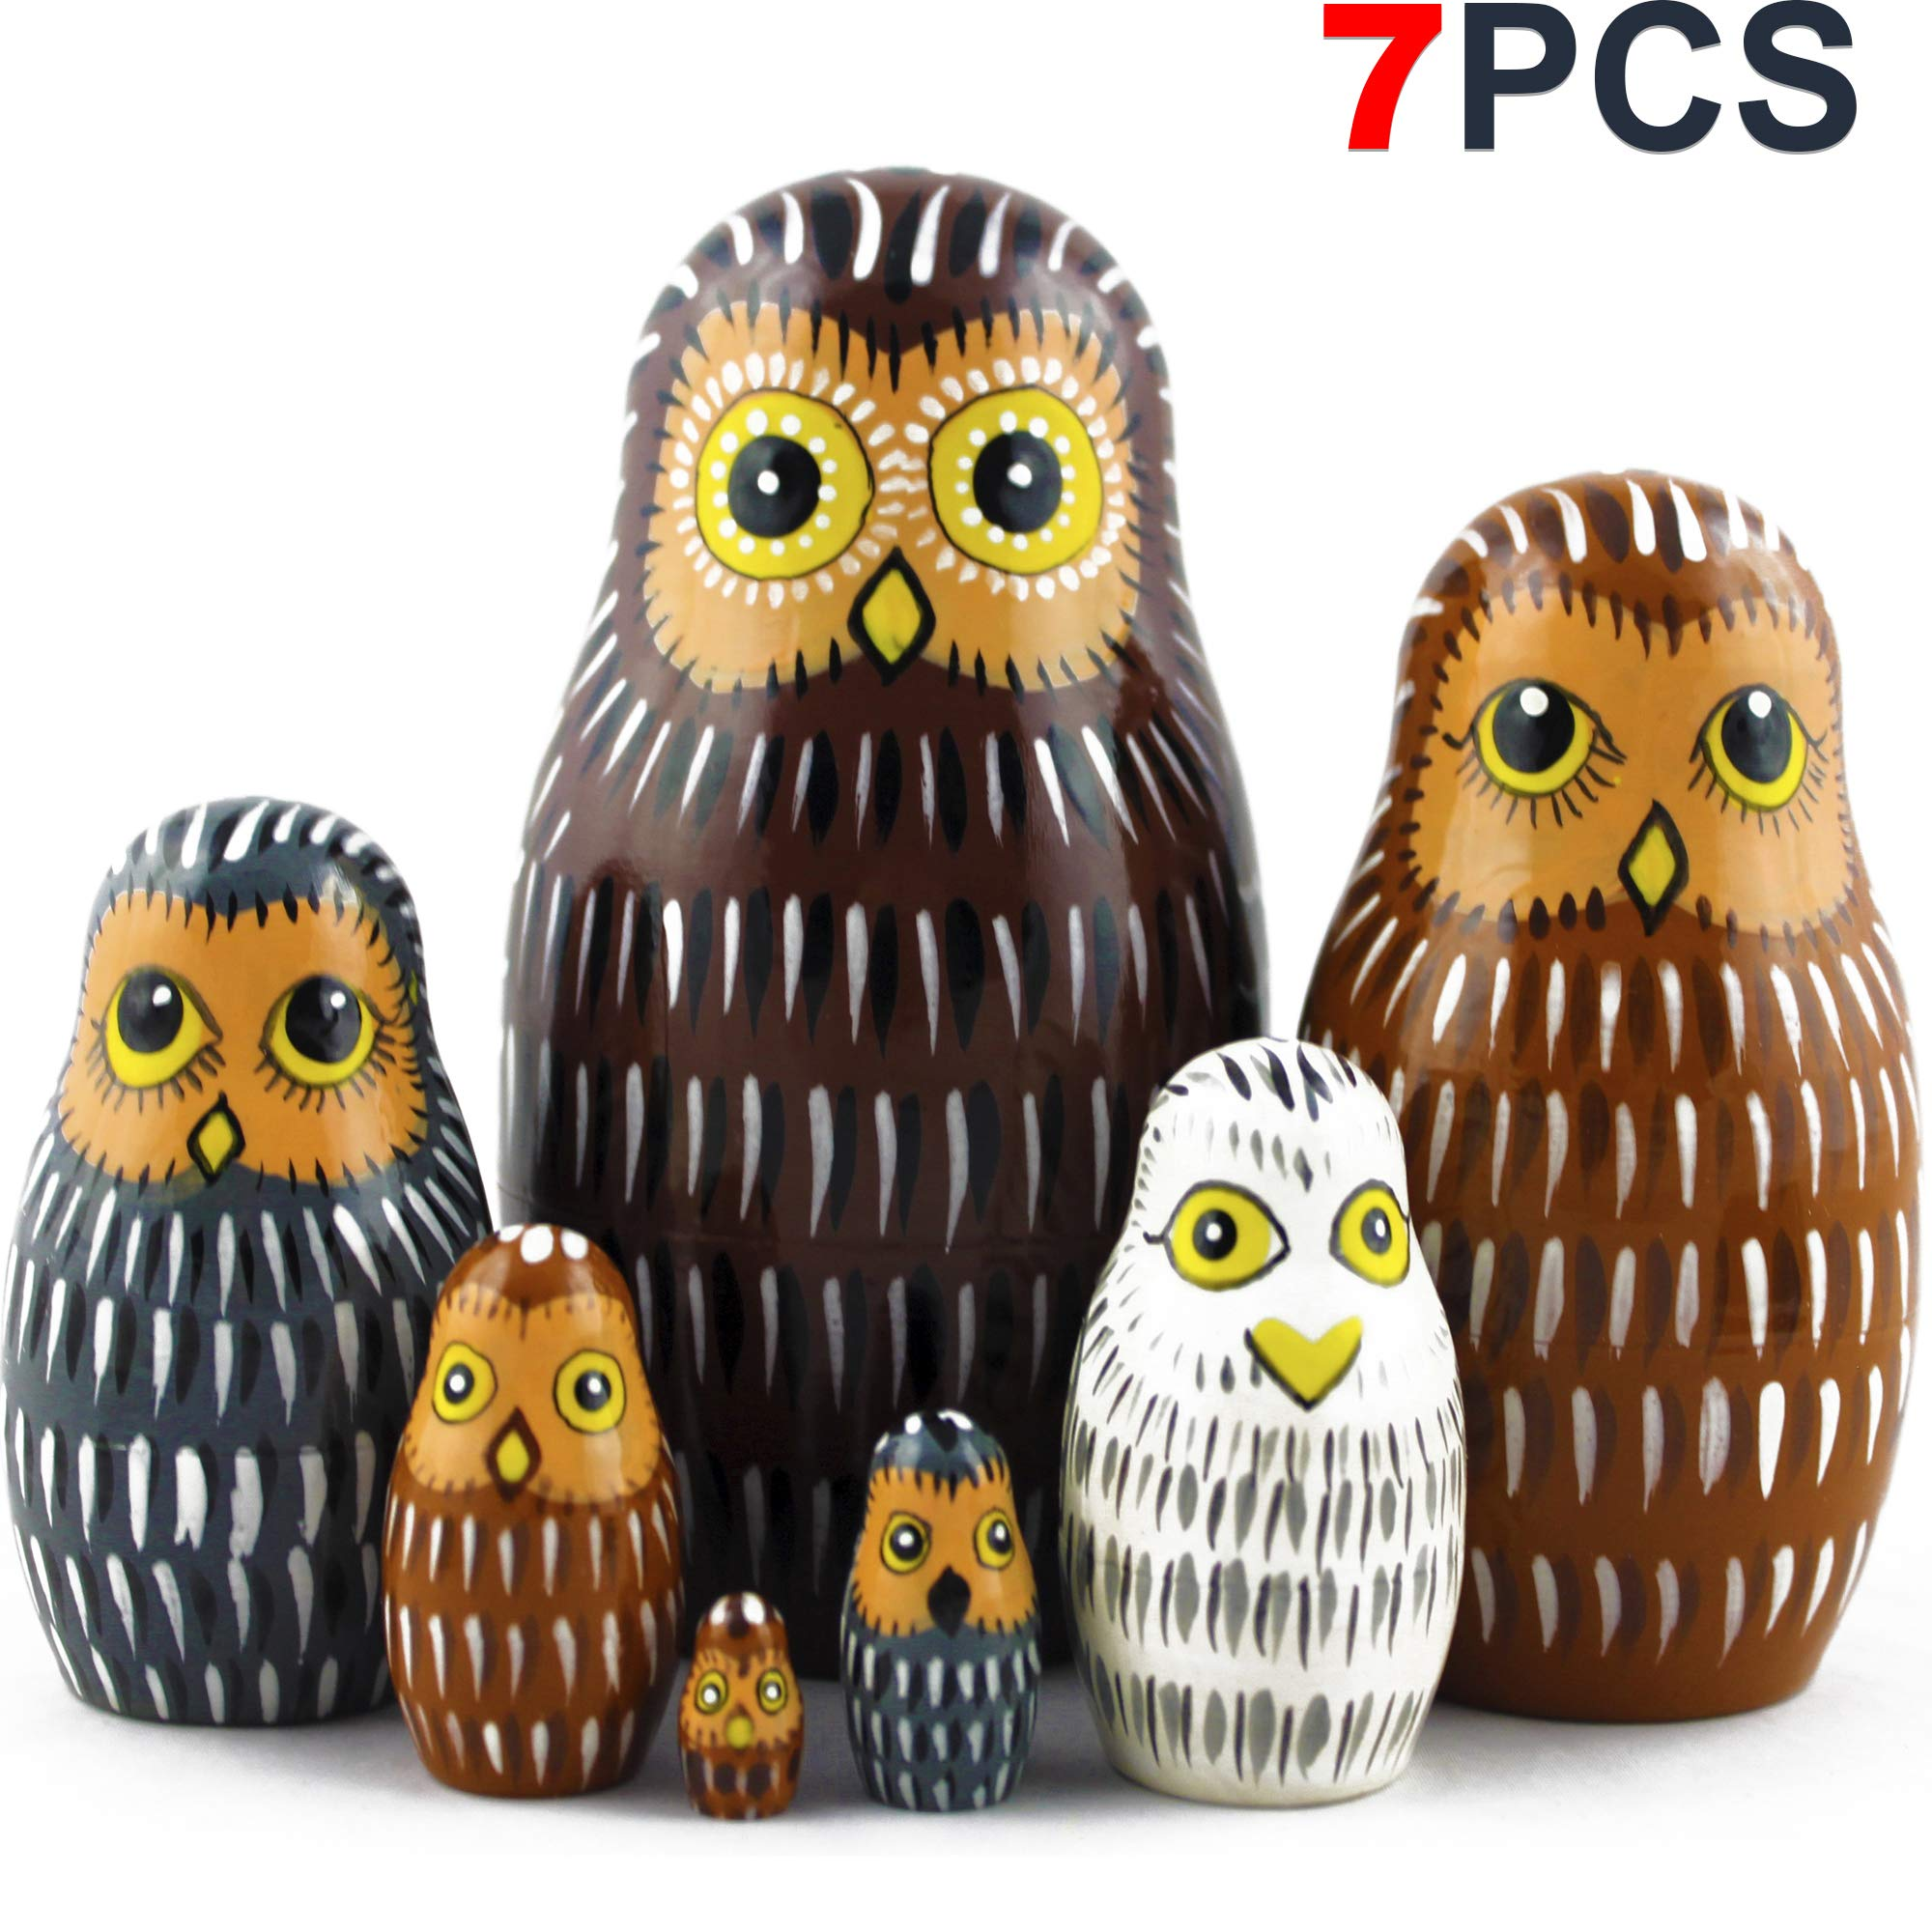 Owl Nesting Dolls - Owl Decor - Owl Gifts - Owl Toy - Matryoshka set 7 dolls